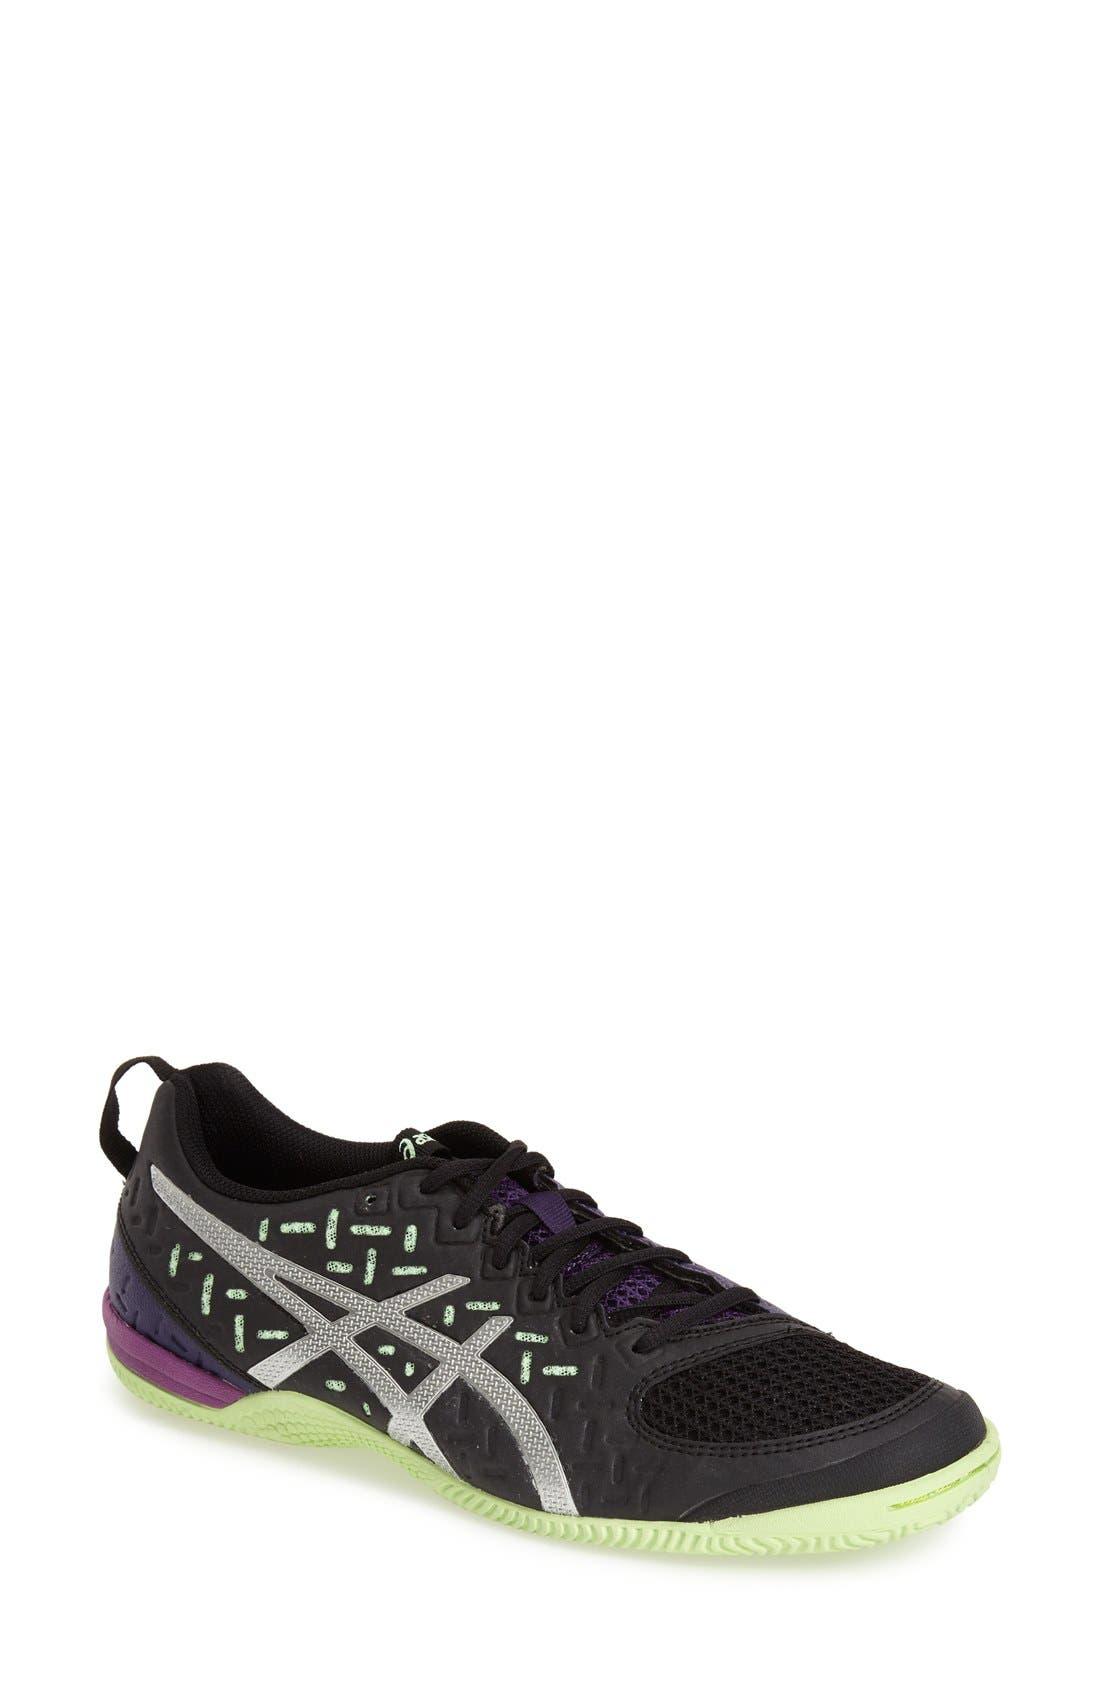 ASICS<SUP>®</SUP> 'GEL Fortus 2' Training Shoe, Main, color, 004